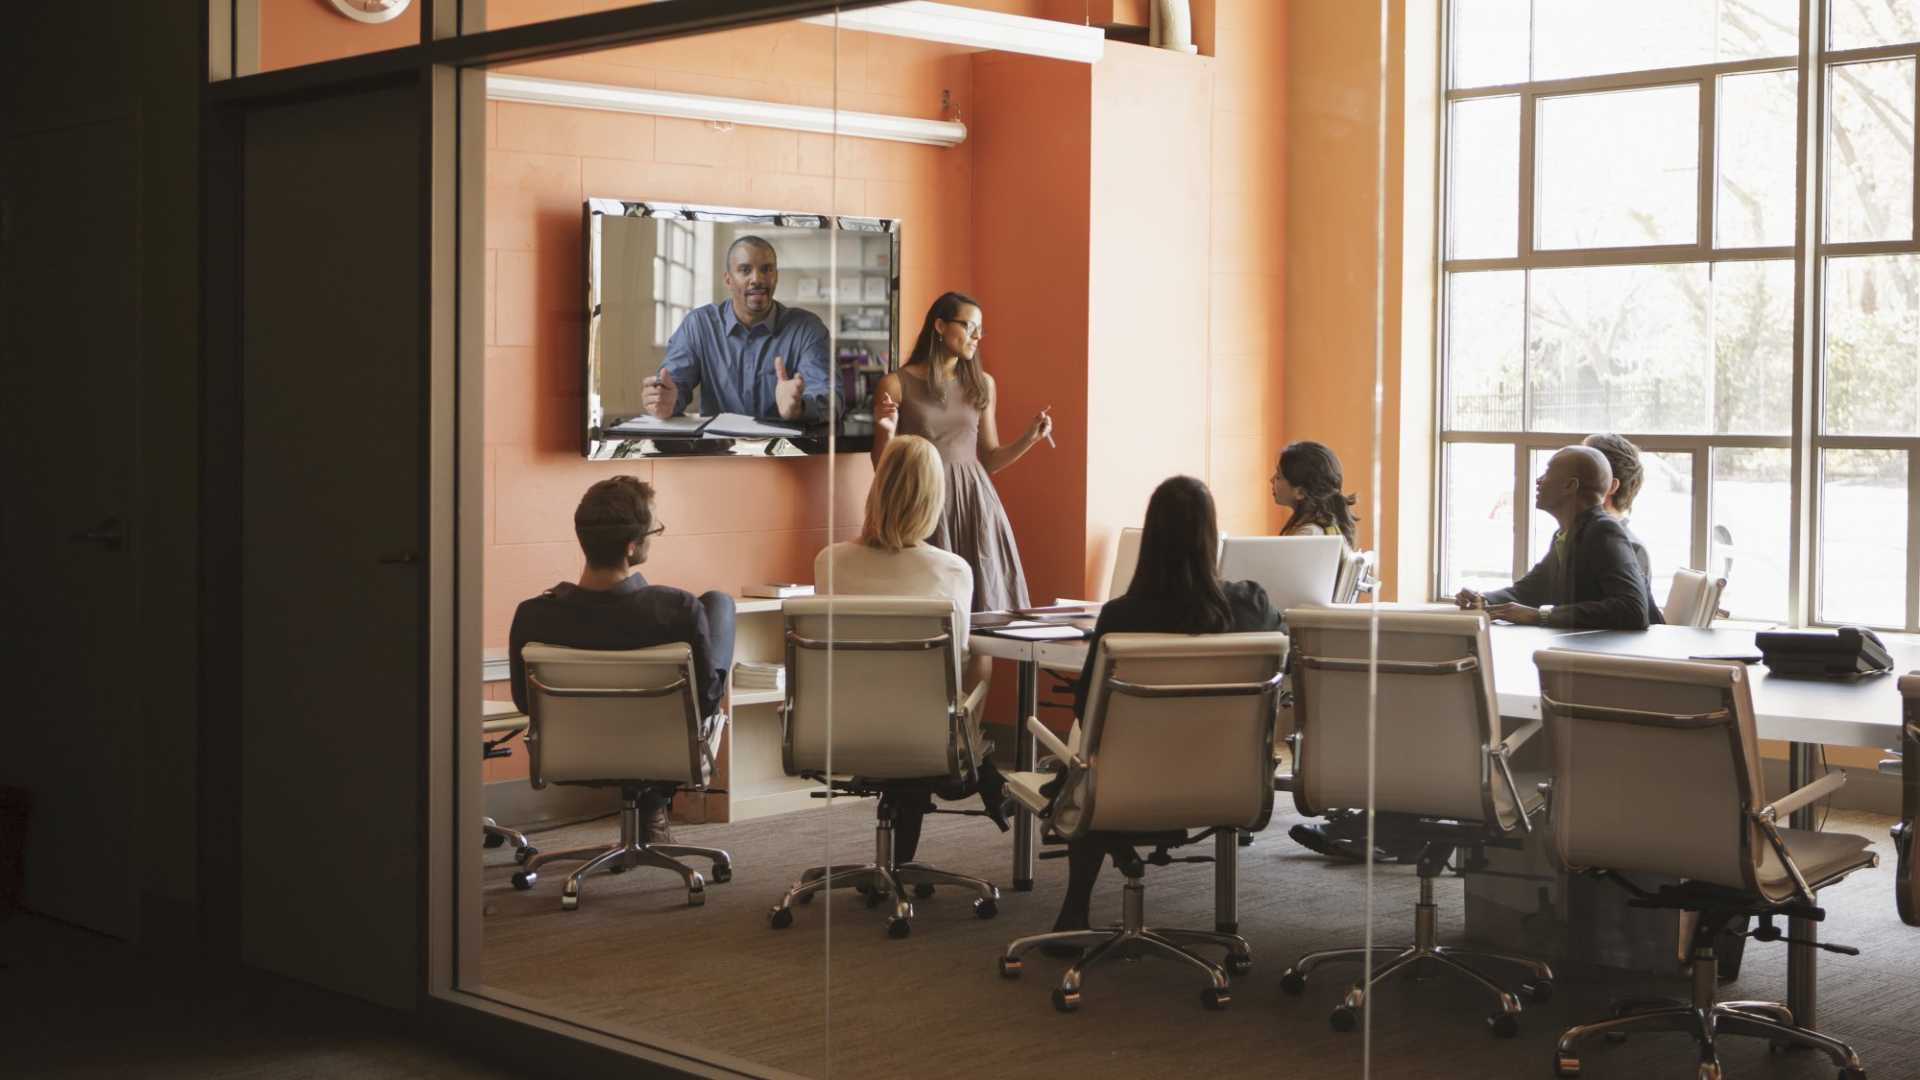 6 Ways Startups Can Build Productive (and Happy) Remote Teams